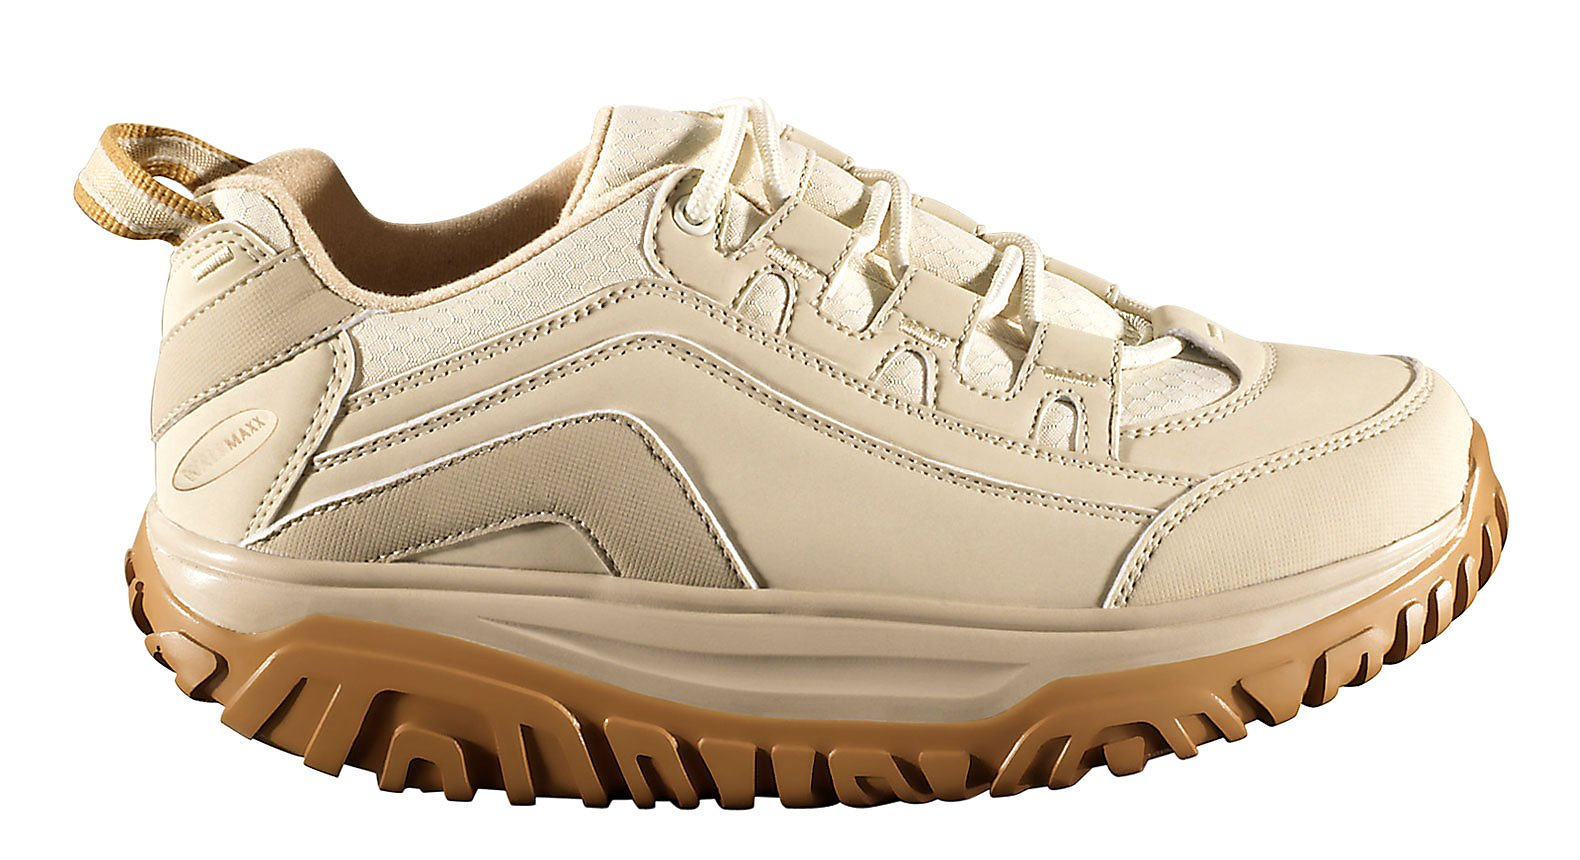 various colors efe5a 5fabc WalkMaxx Outdoor-Fitness-Schuh, beige Größe: 39 | Weltbild.at